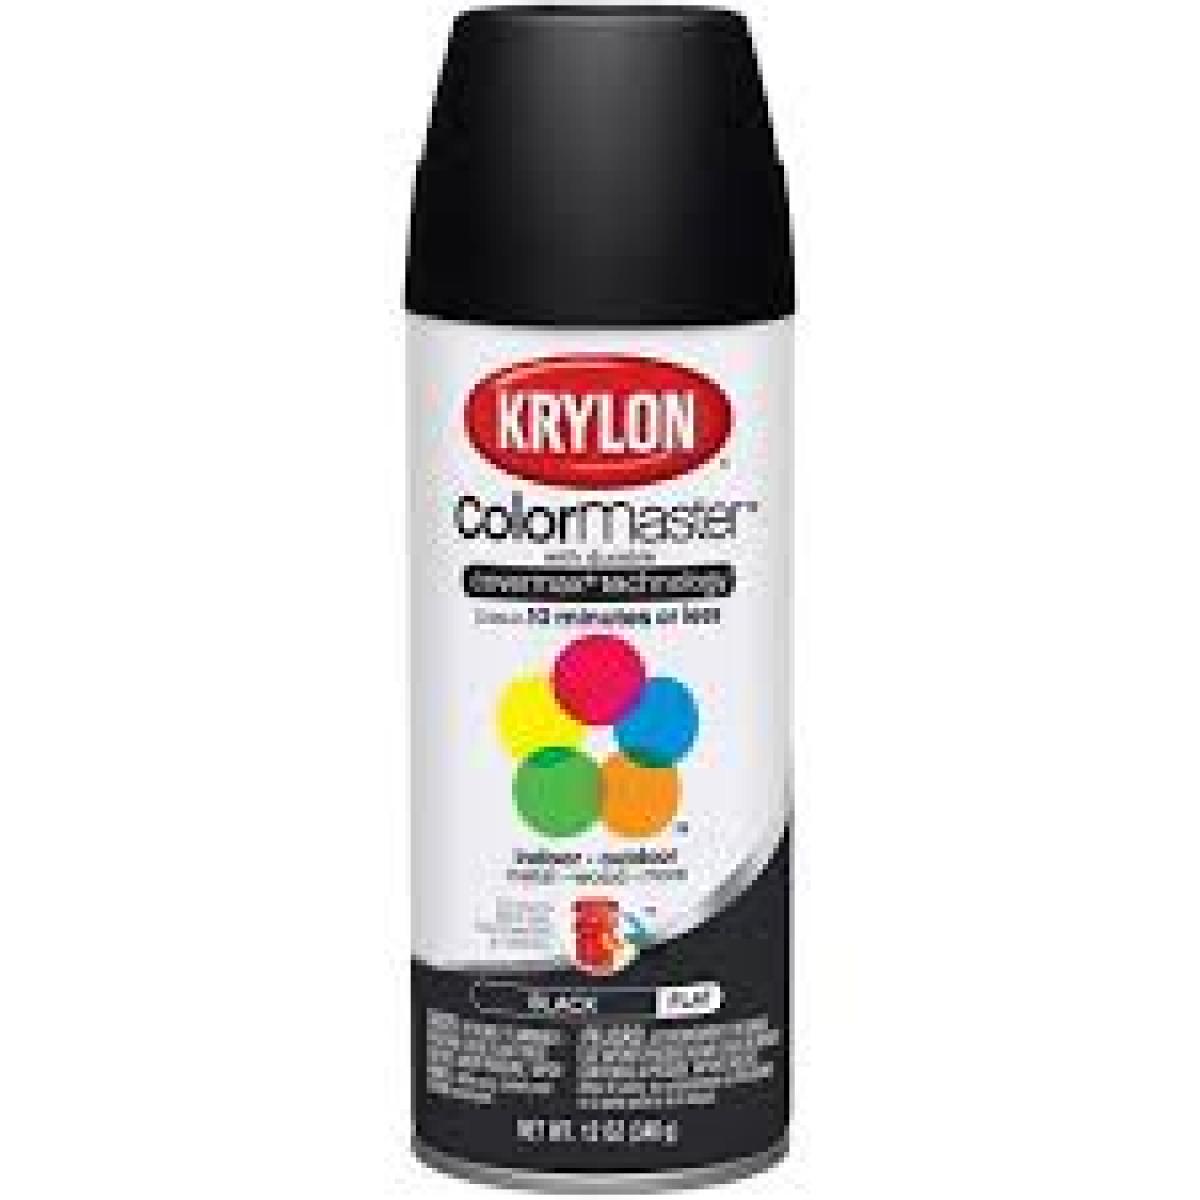 K1316 Krylon Black Spray Primer Spray Paint Paint And Sundries Amarillo Bolt